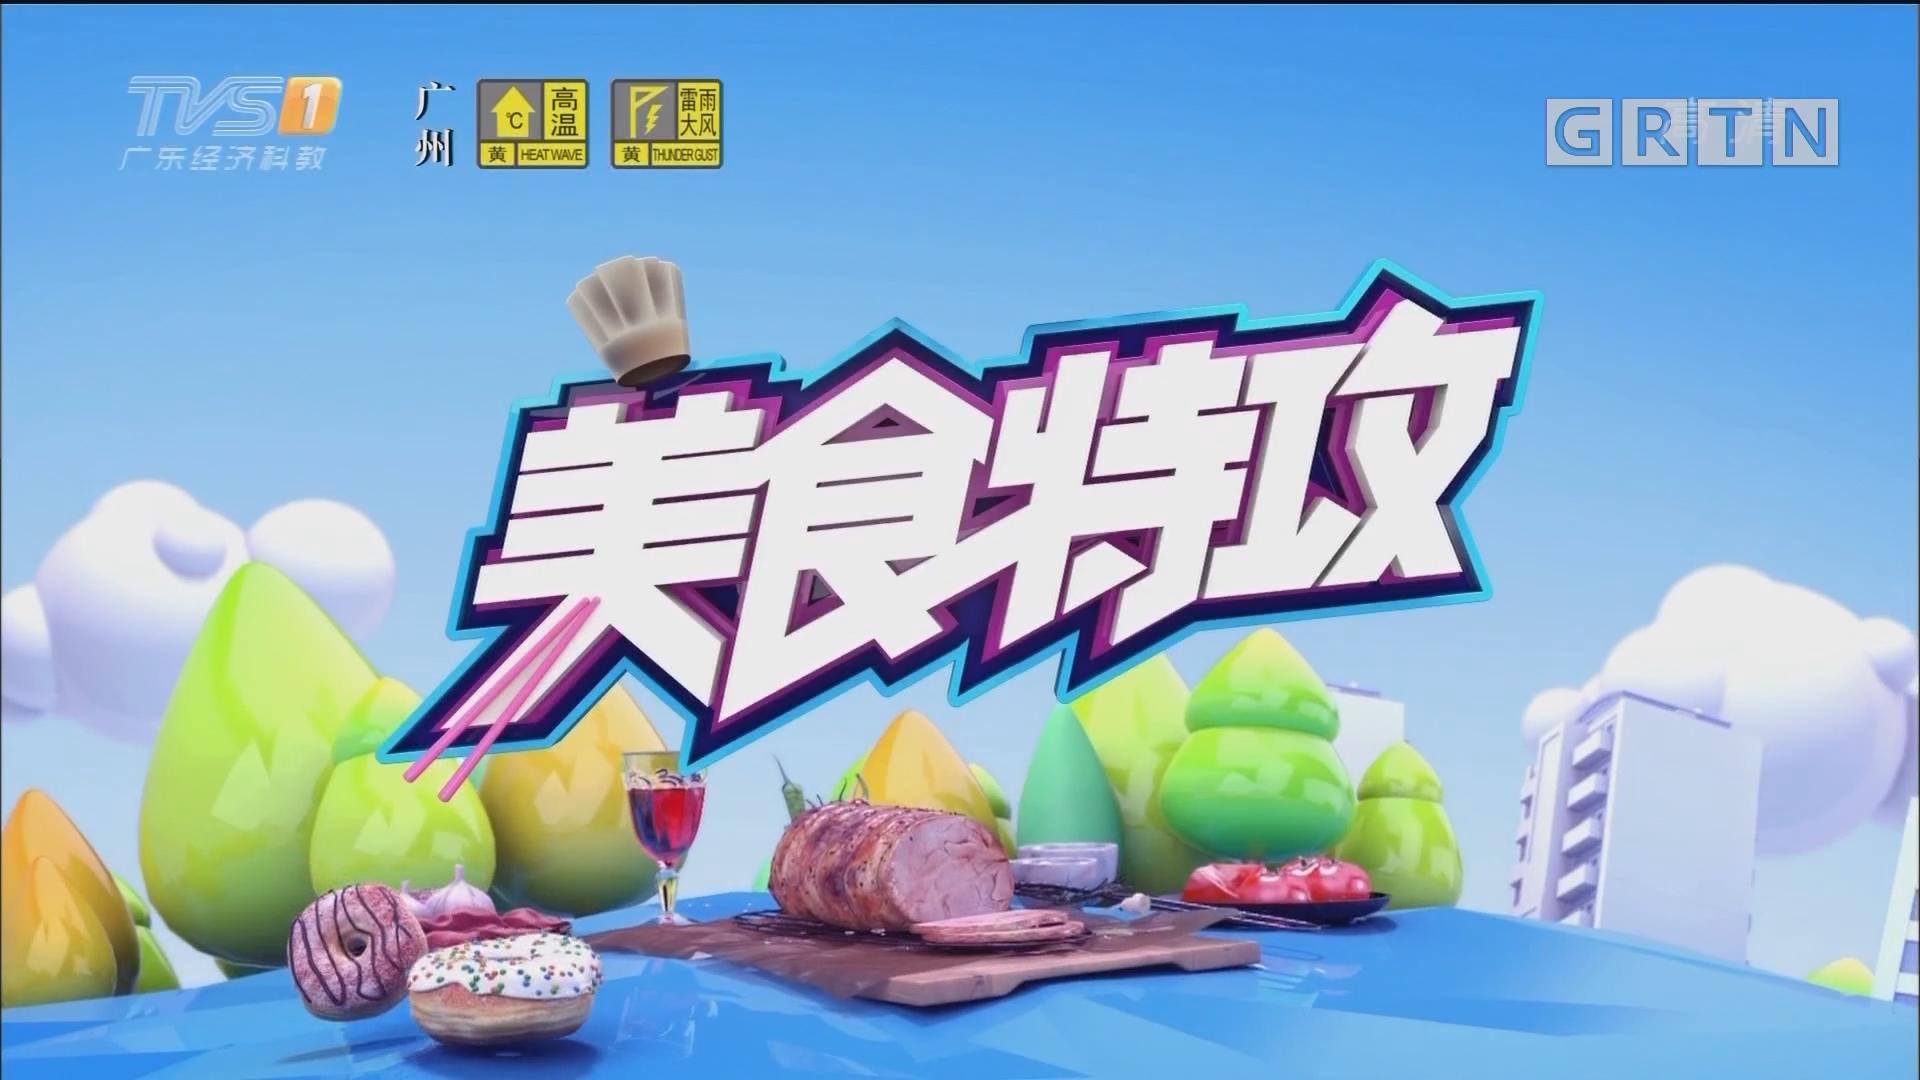 [HD][2019-08-06]马后炮生活+《美食特攻》:香菇肉臊 一份会想念的味道